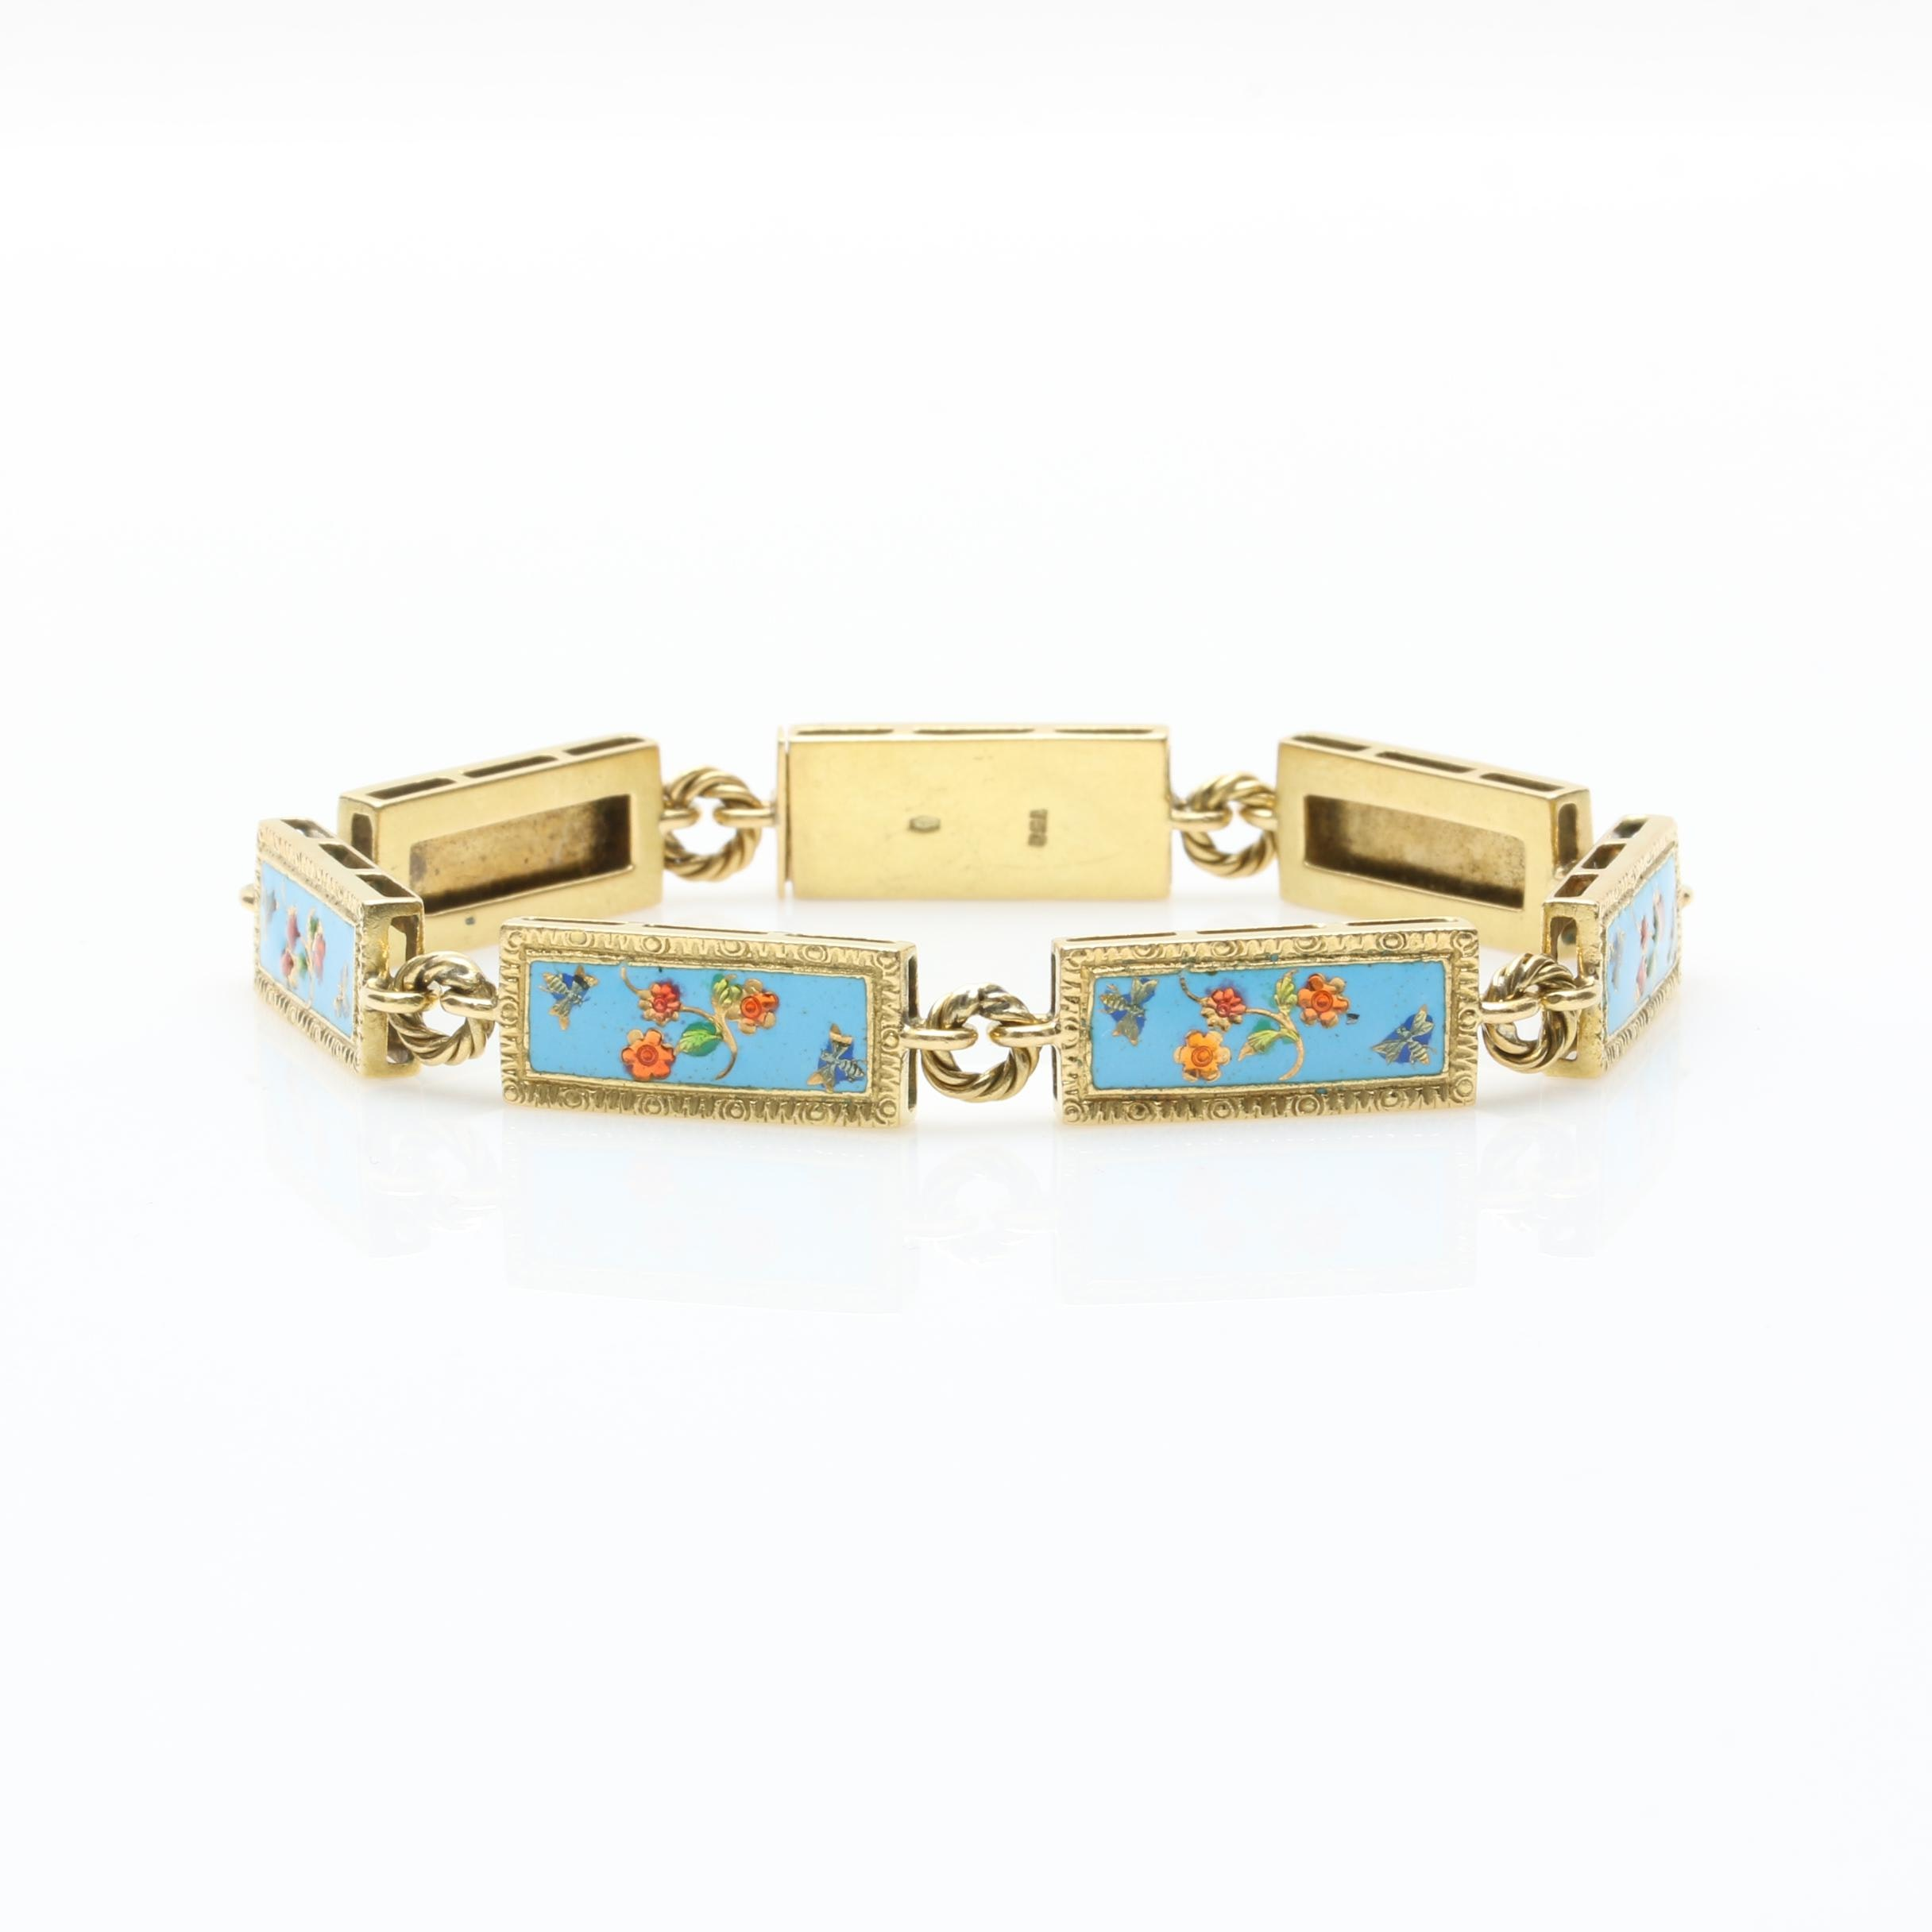 18K Yellow Gold Enamel Link Bracelet